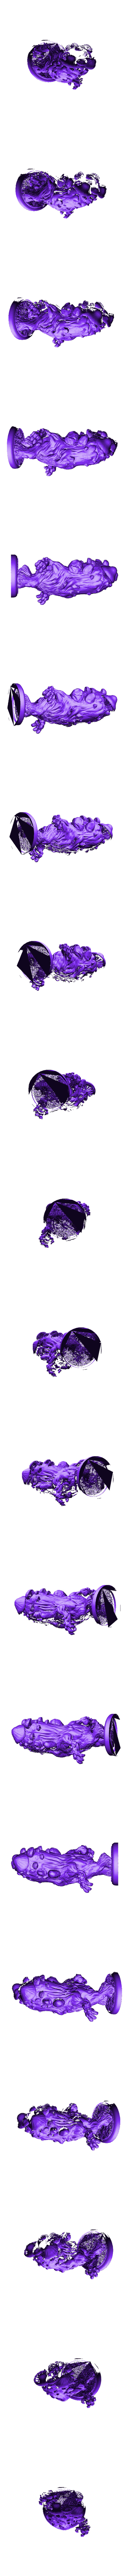 Hombre Seta 2.stl Download free STL file Custom Halfling BB Equipment (Mushroom Men) • 3D printer template, calaverd